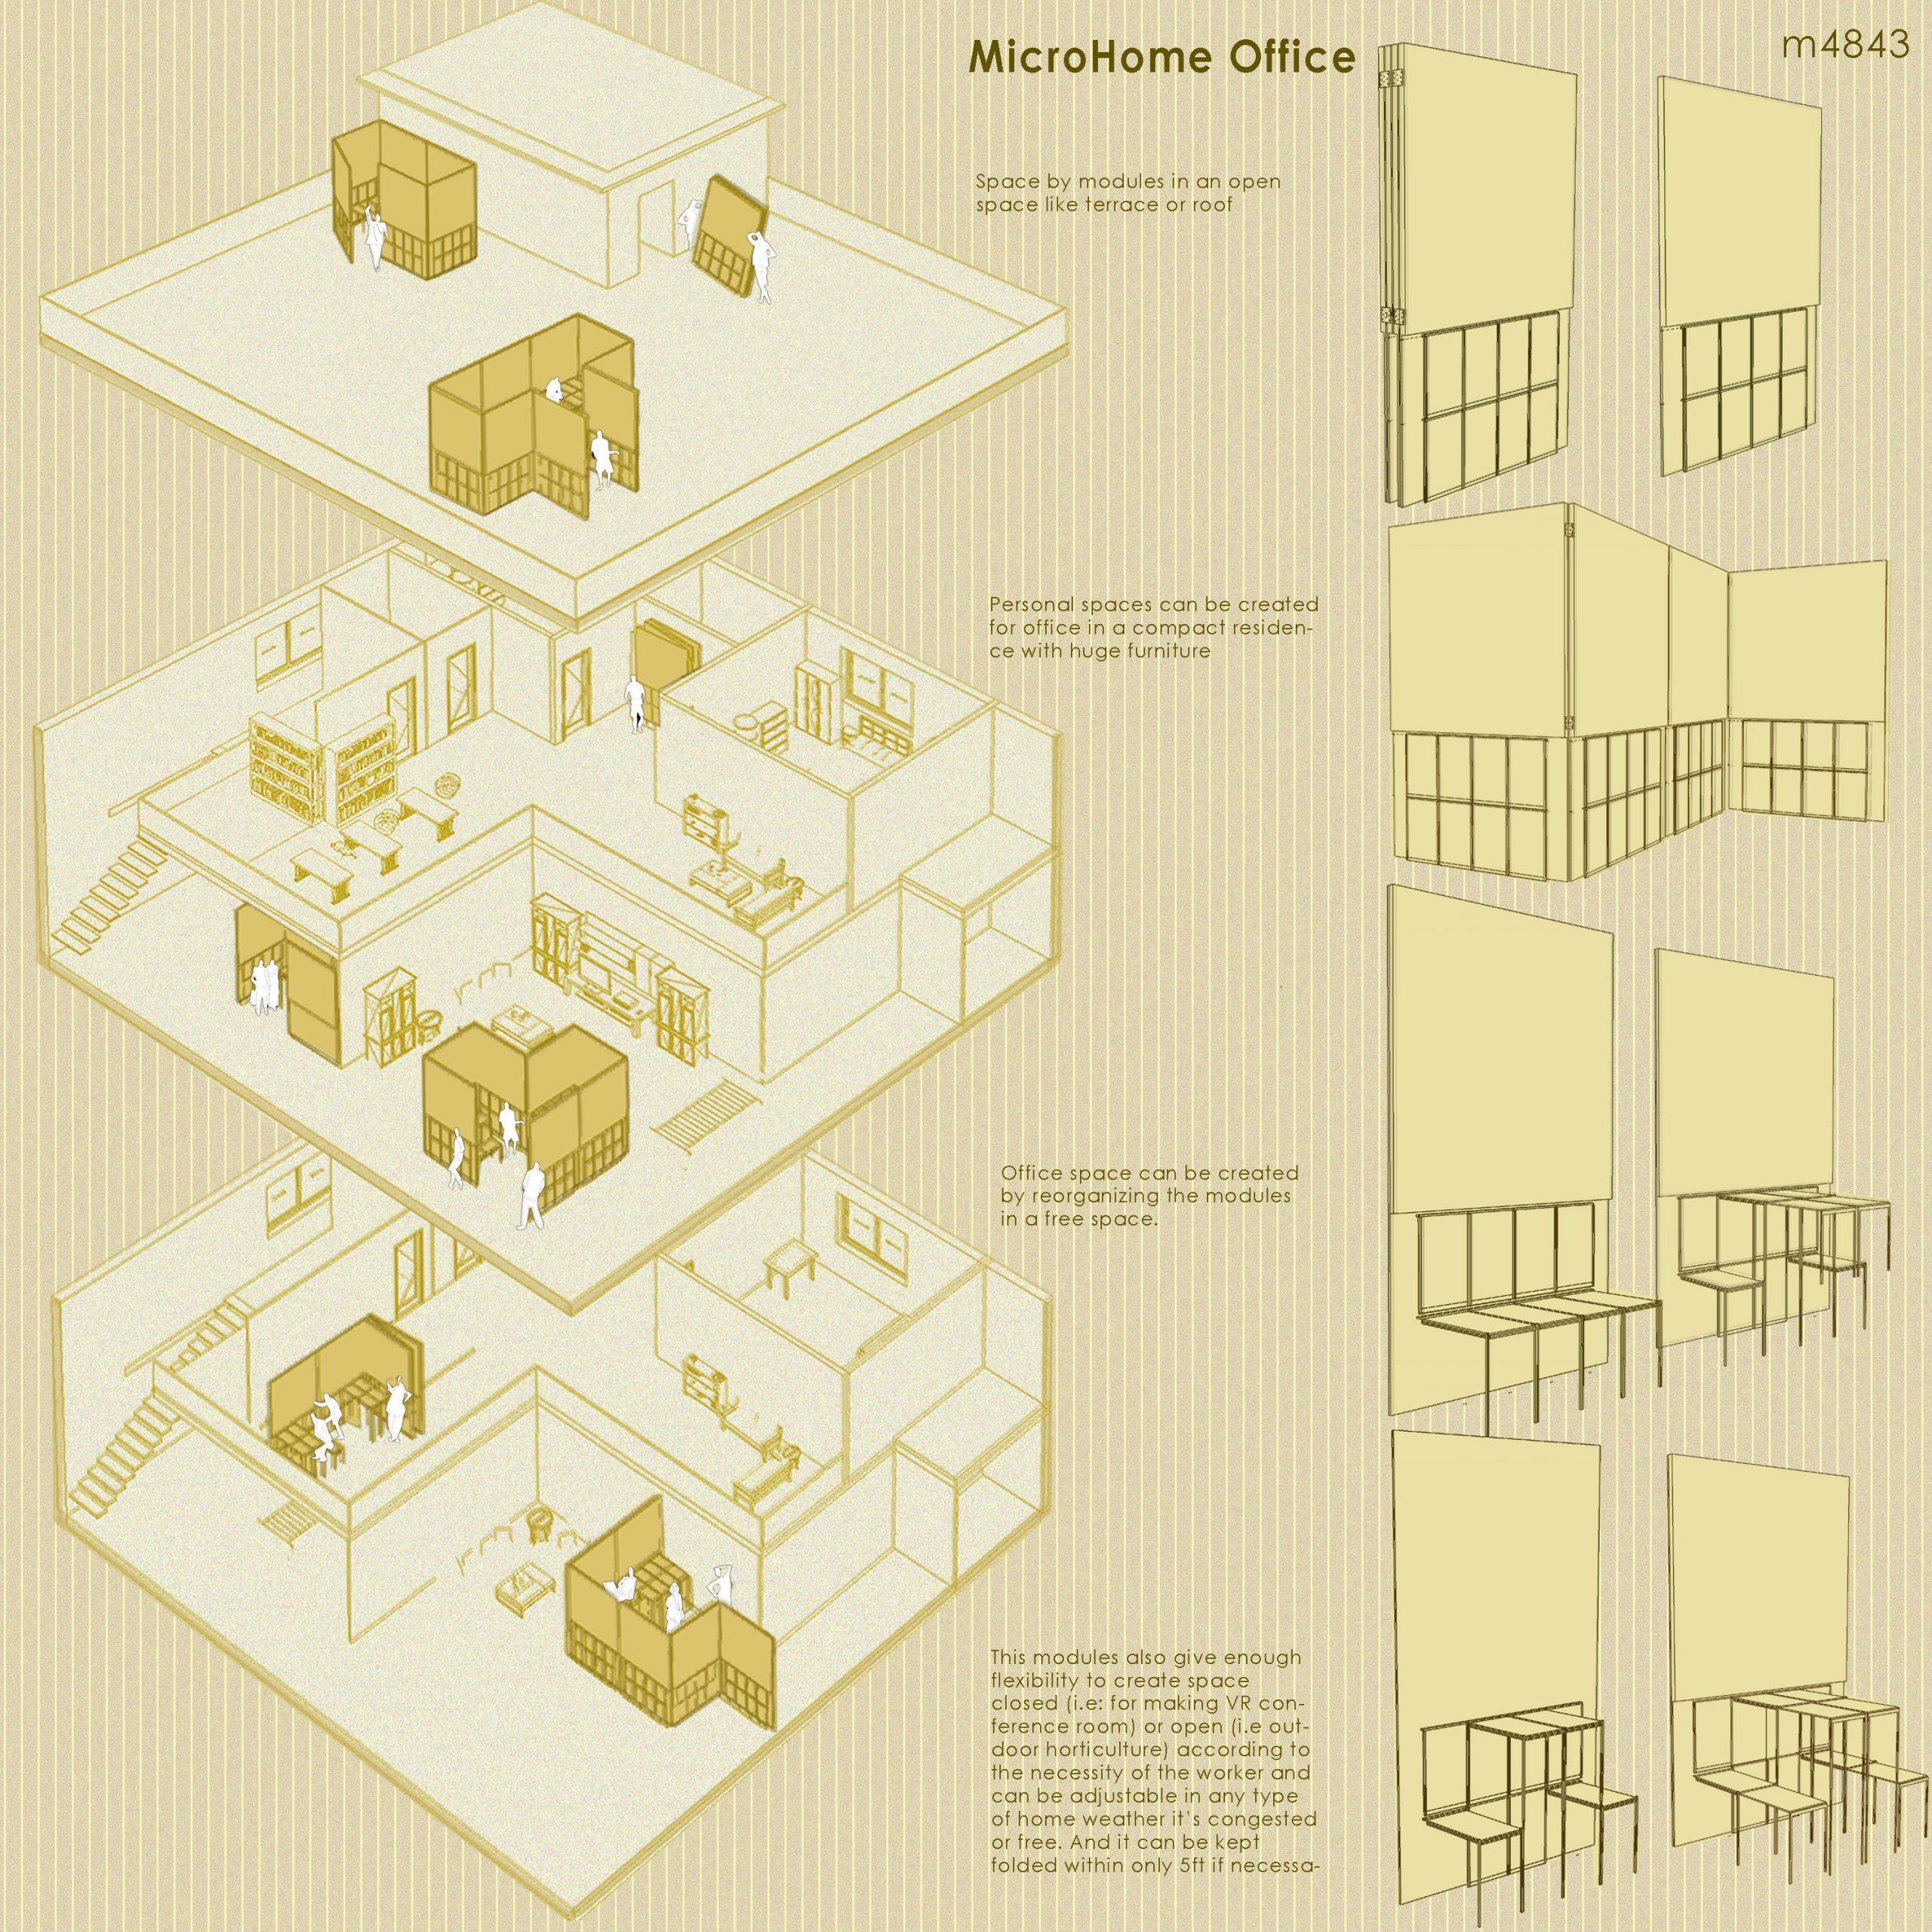 MicroHome Office: Let's install it - by Pronoy Chowdhurym, Anirudva Bhowmik & Fahad Khan